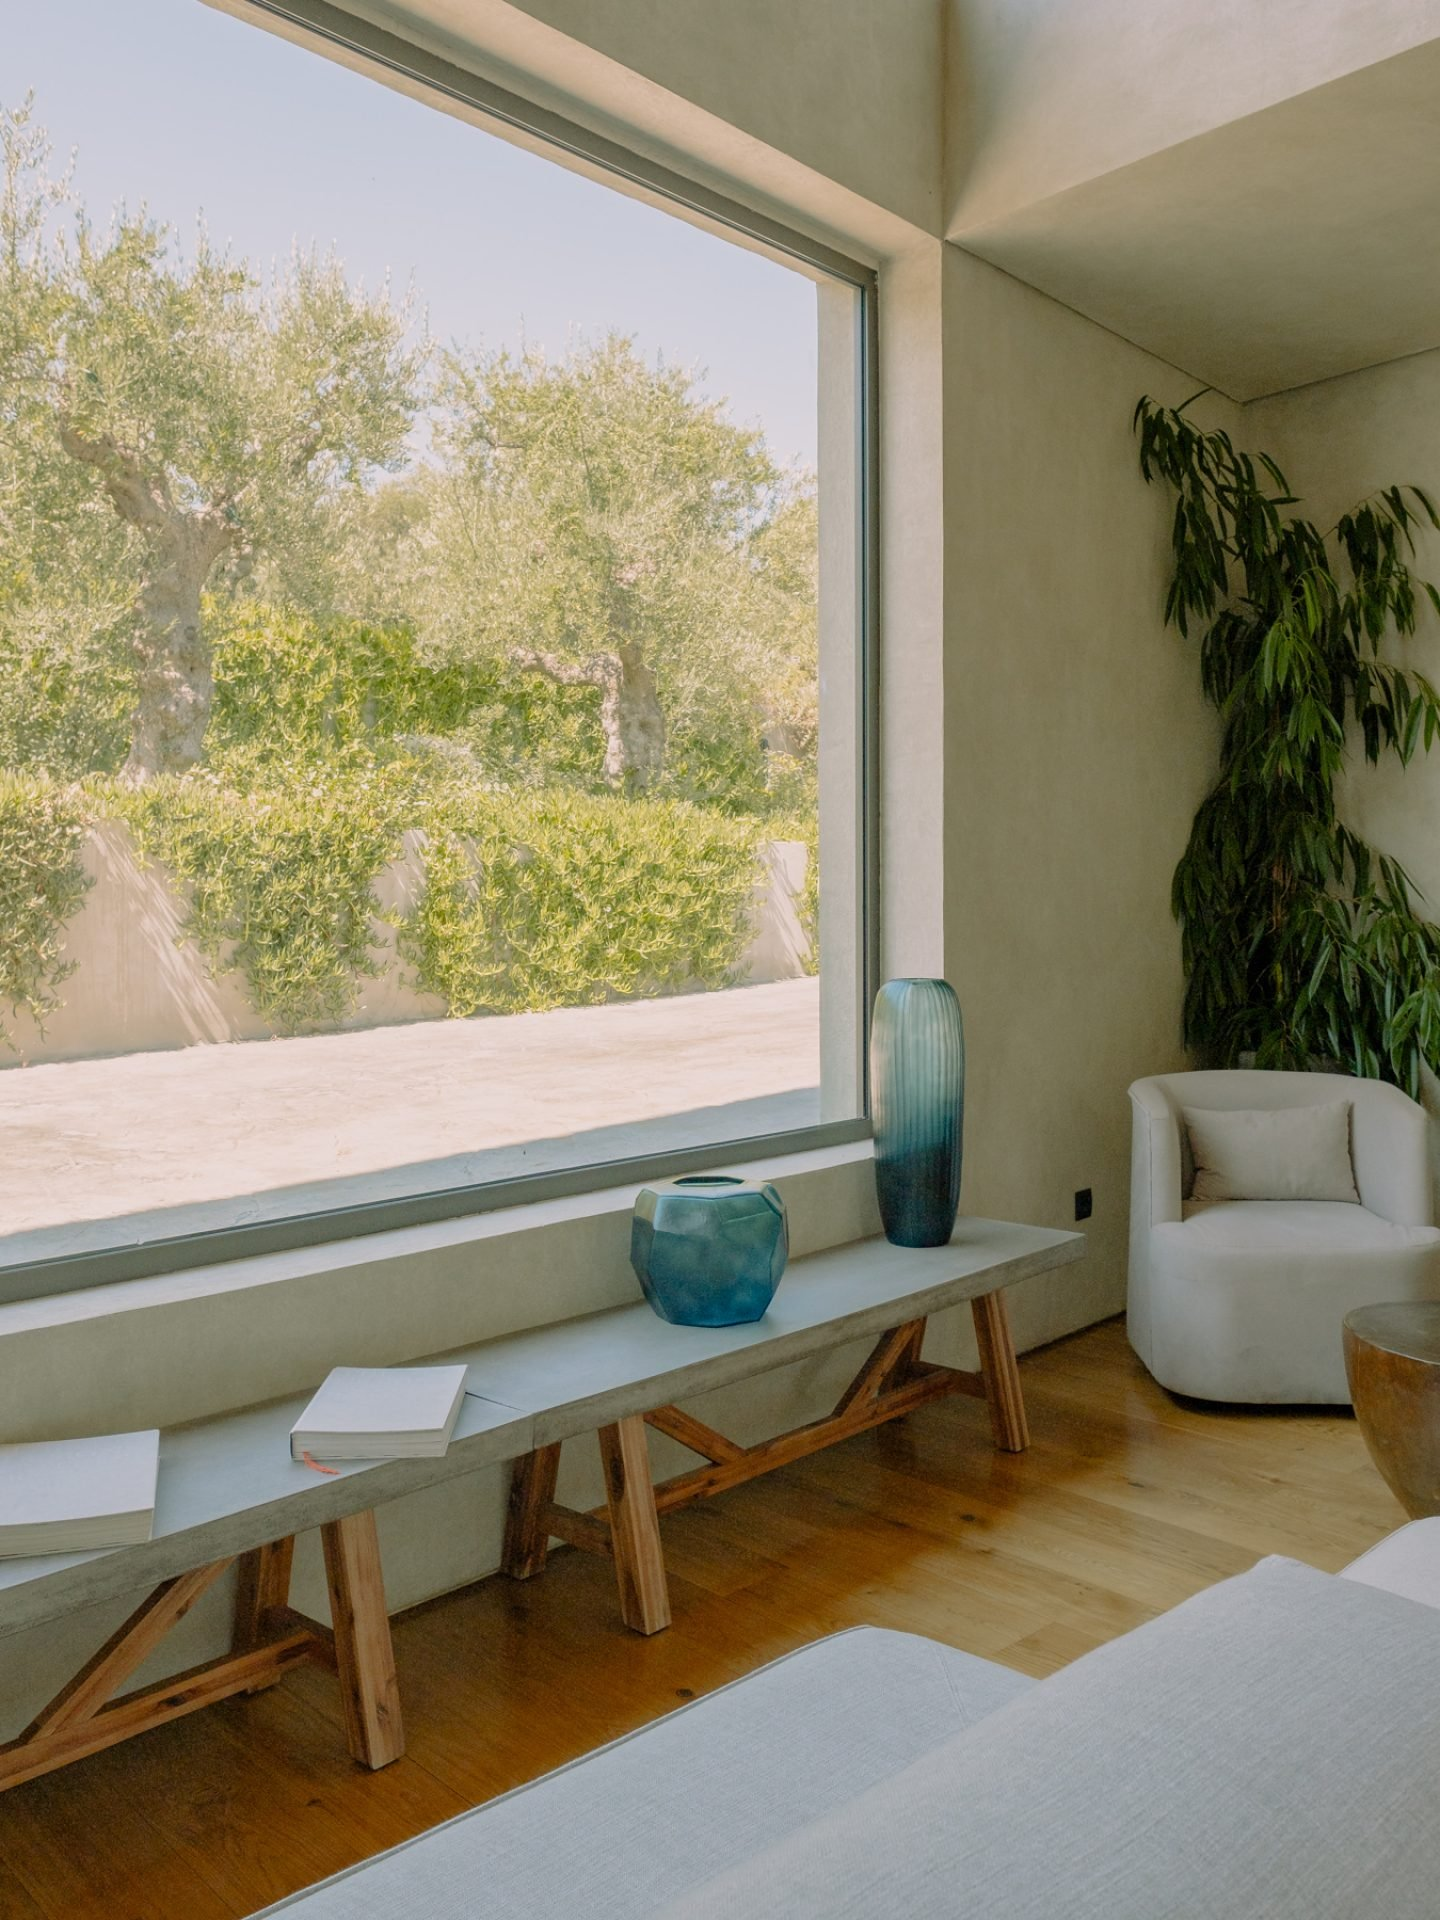 IGNANT-Travel-Olea-All-Suite-hotel-Greece-022